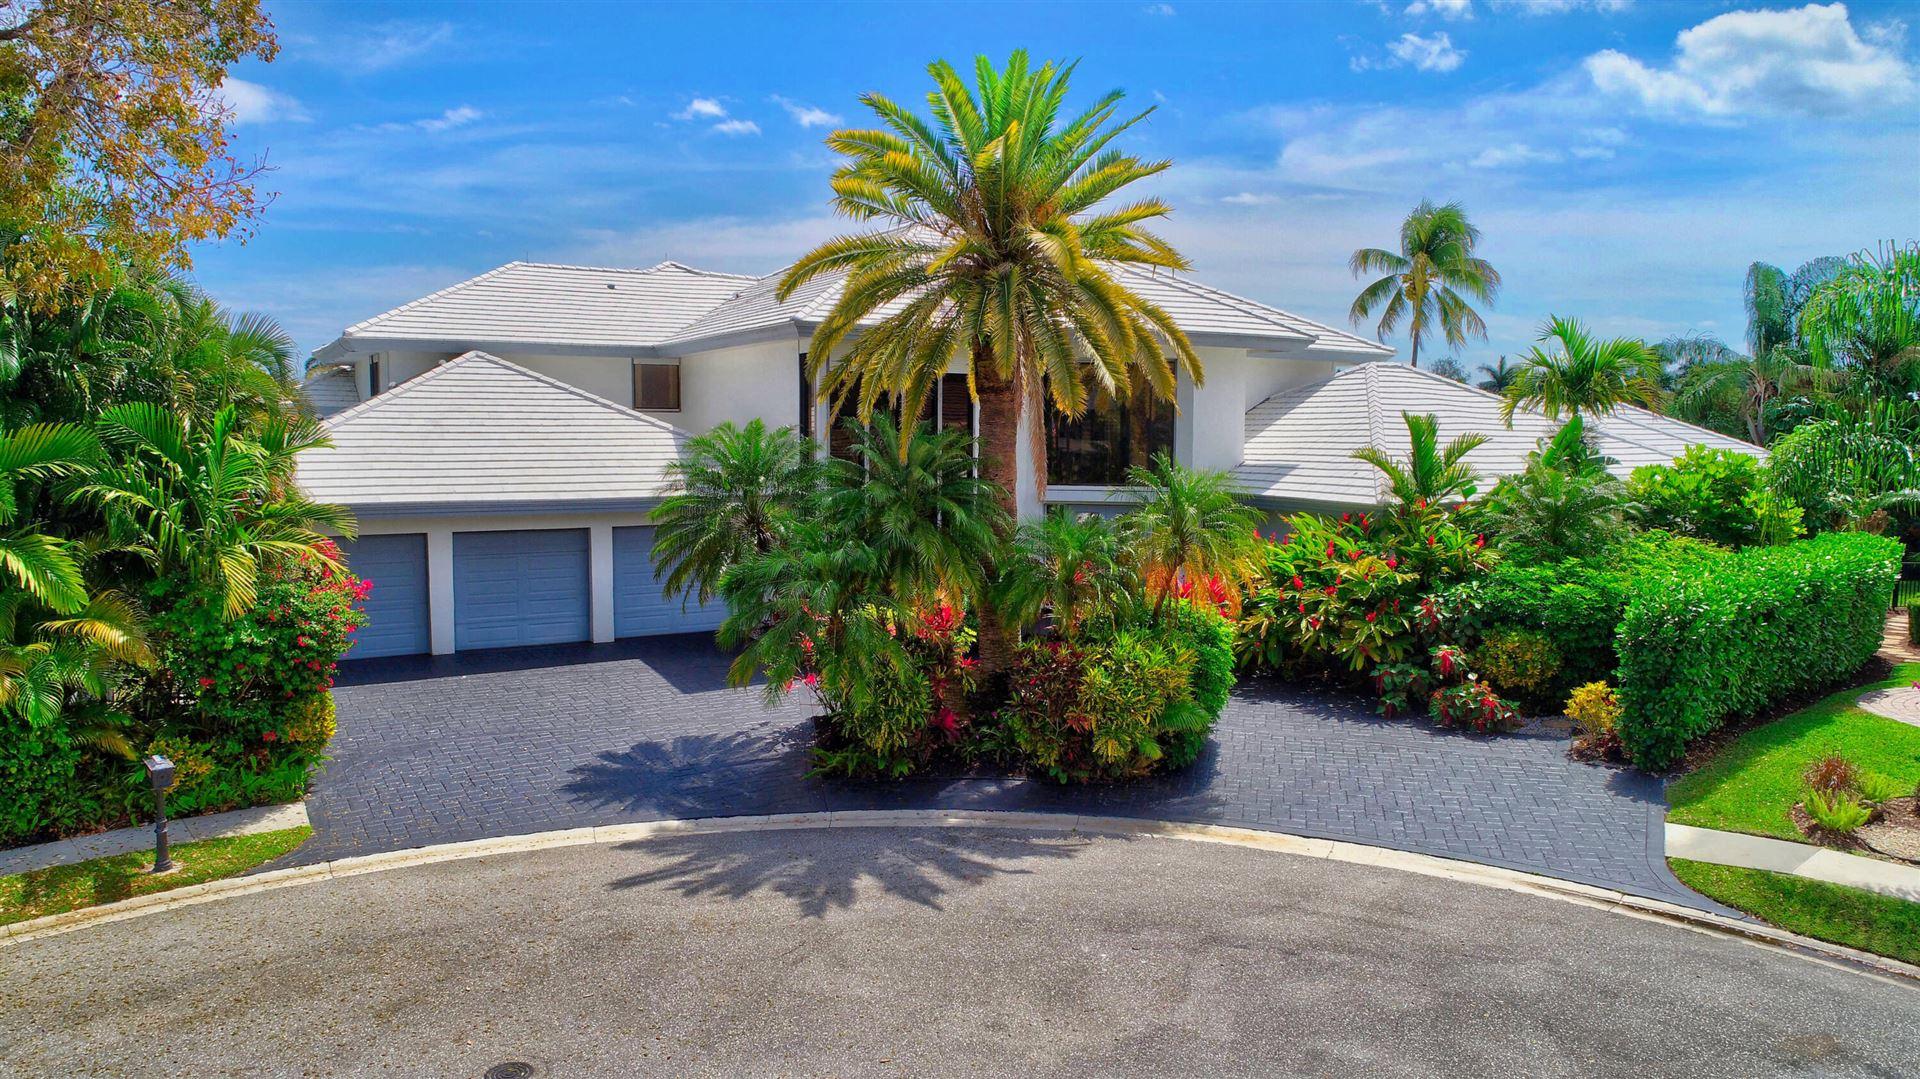 21180 Oakley Court, Boca Raton, FL 33433 - #: RX-10705880